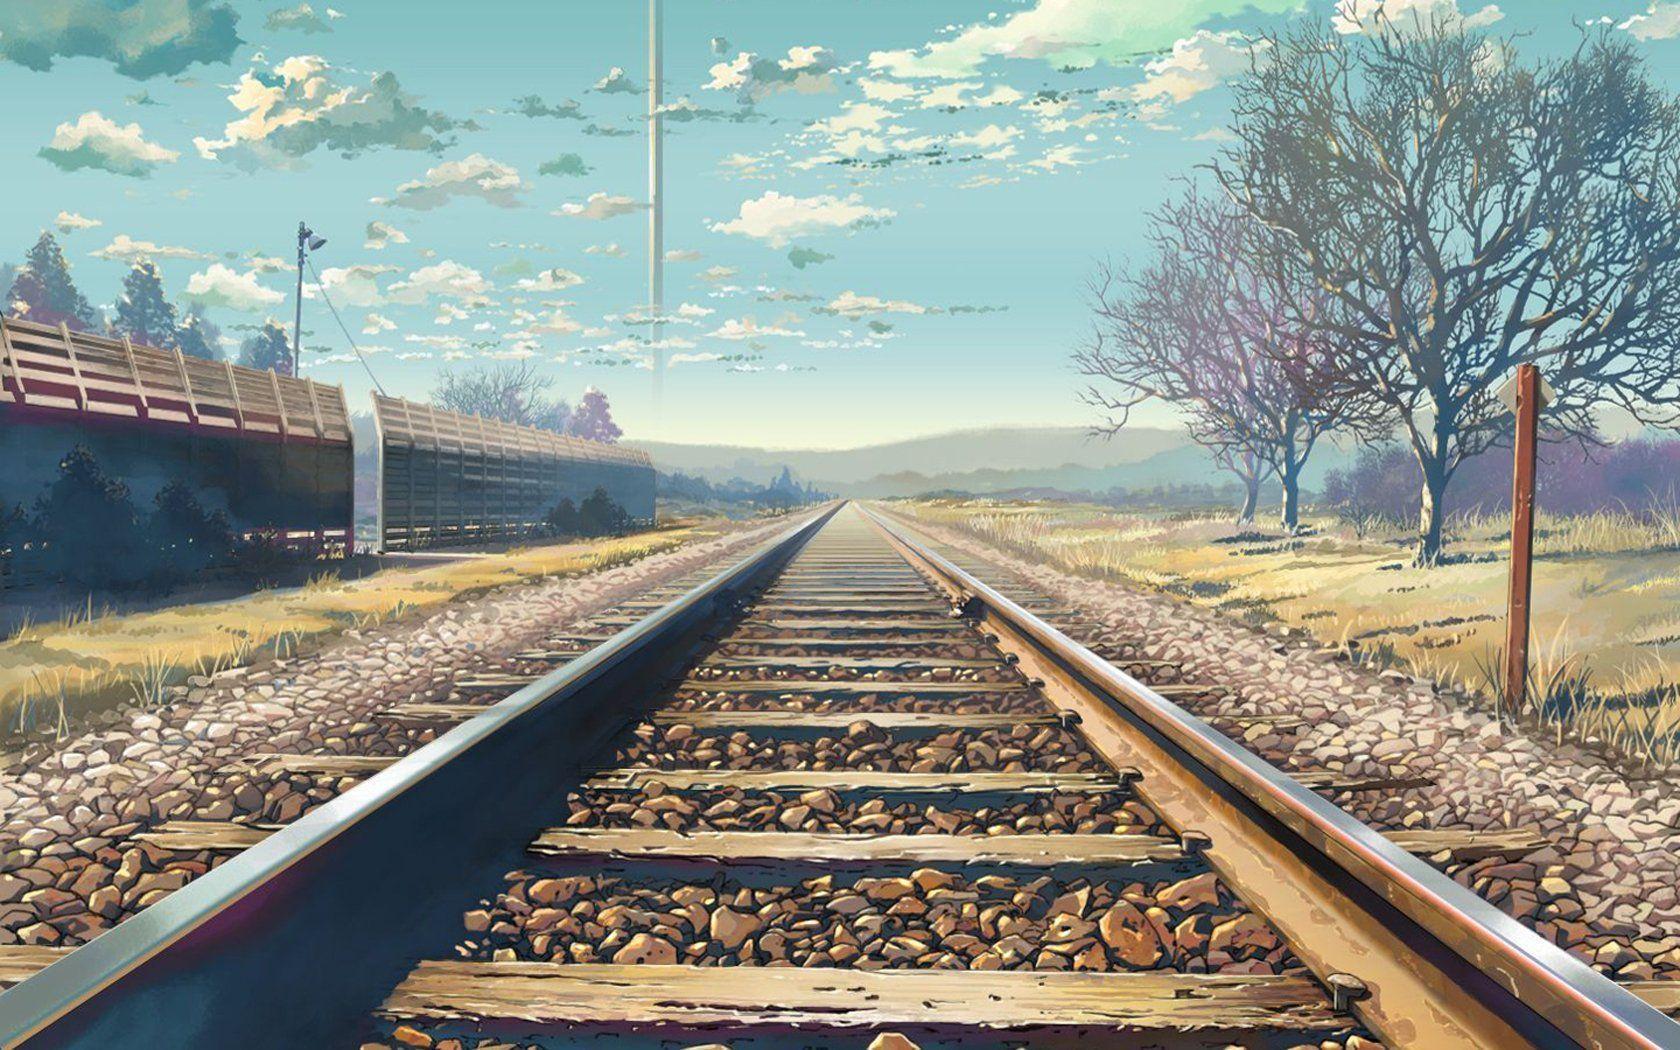 301 Railroad HD Wallpapers